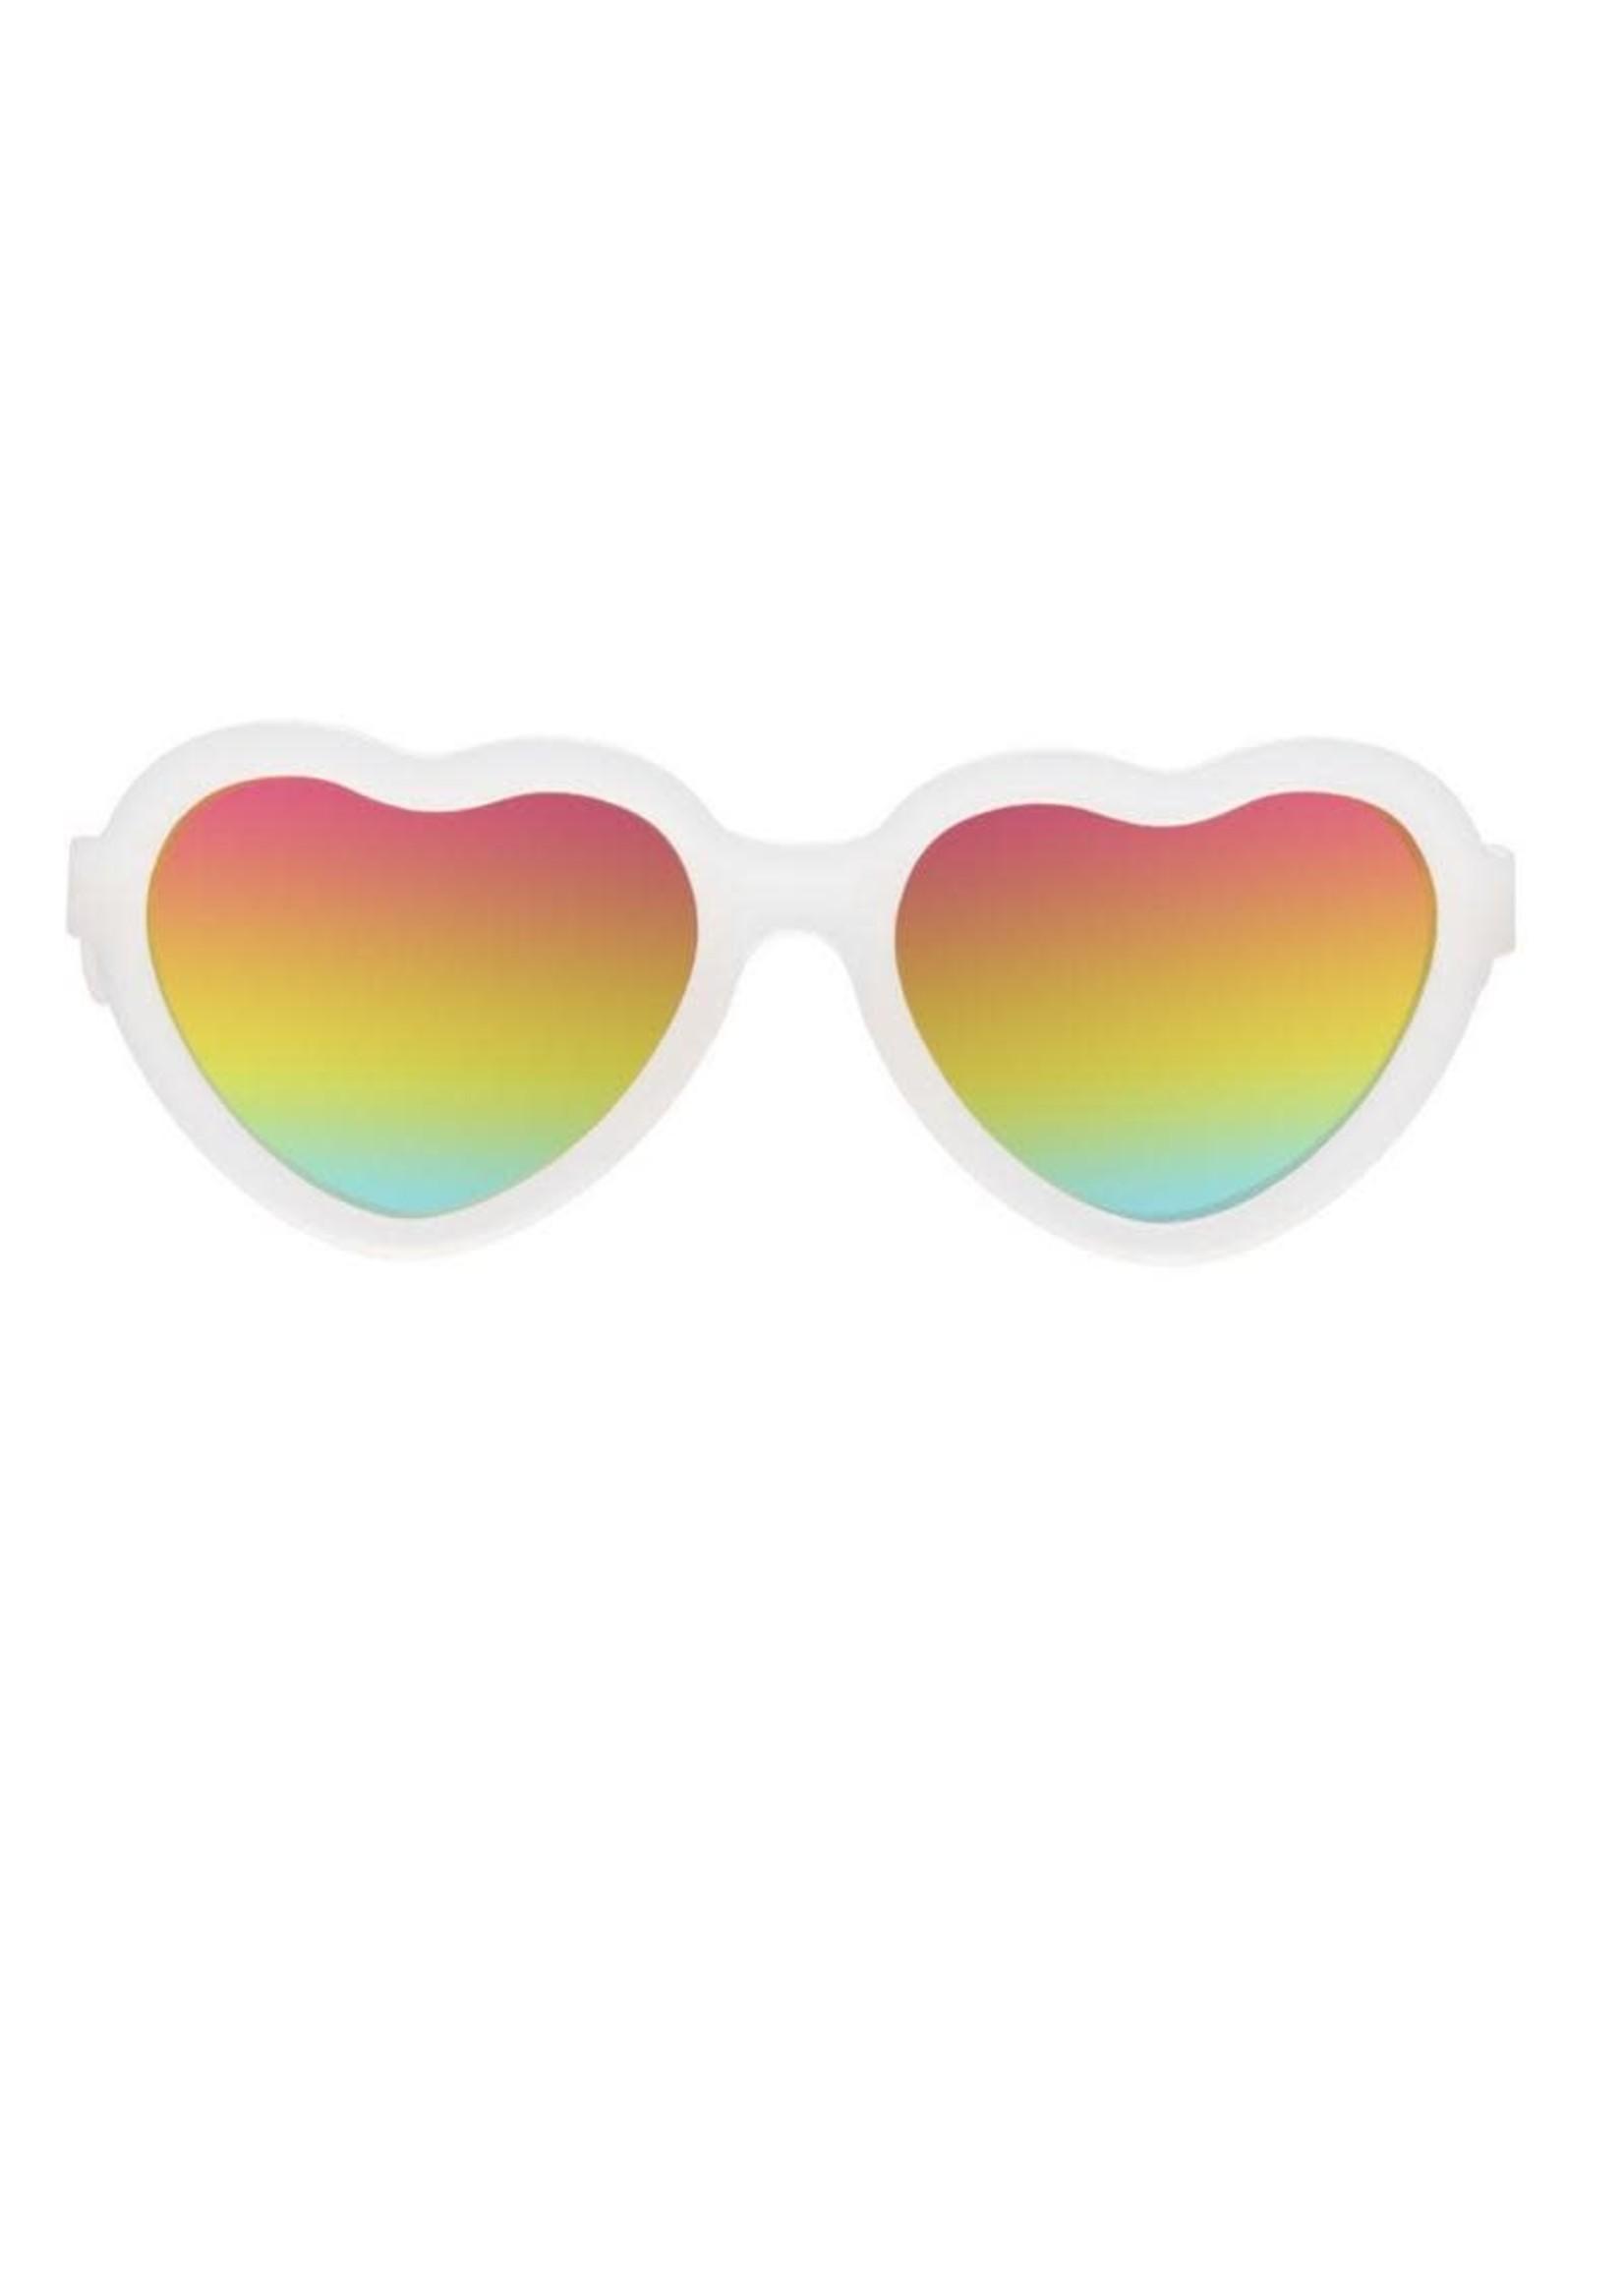 Babiators Babiators, Sweethearts Transprent Sunglasses w/ Rainbow Bright Lens